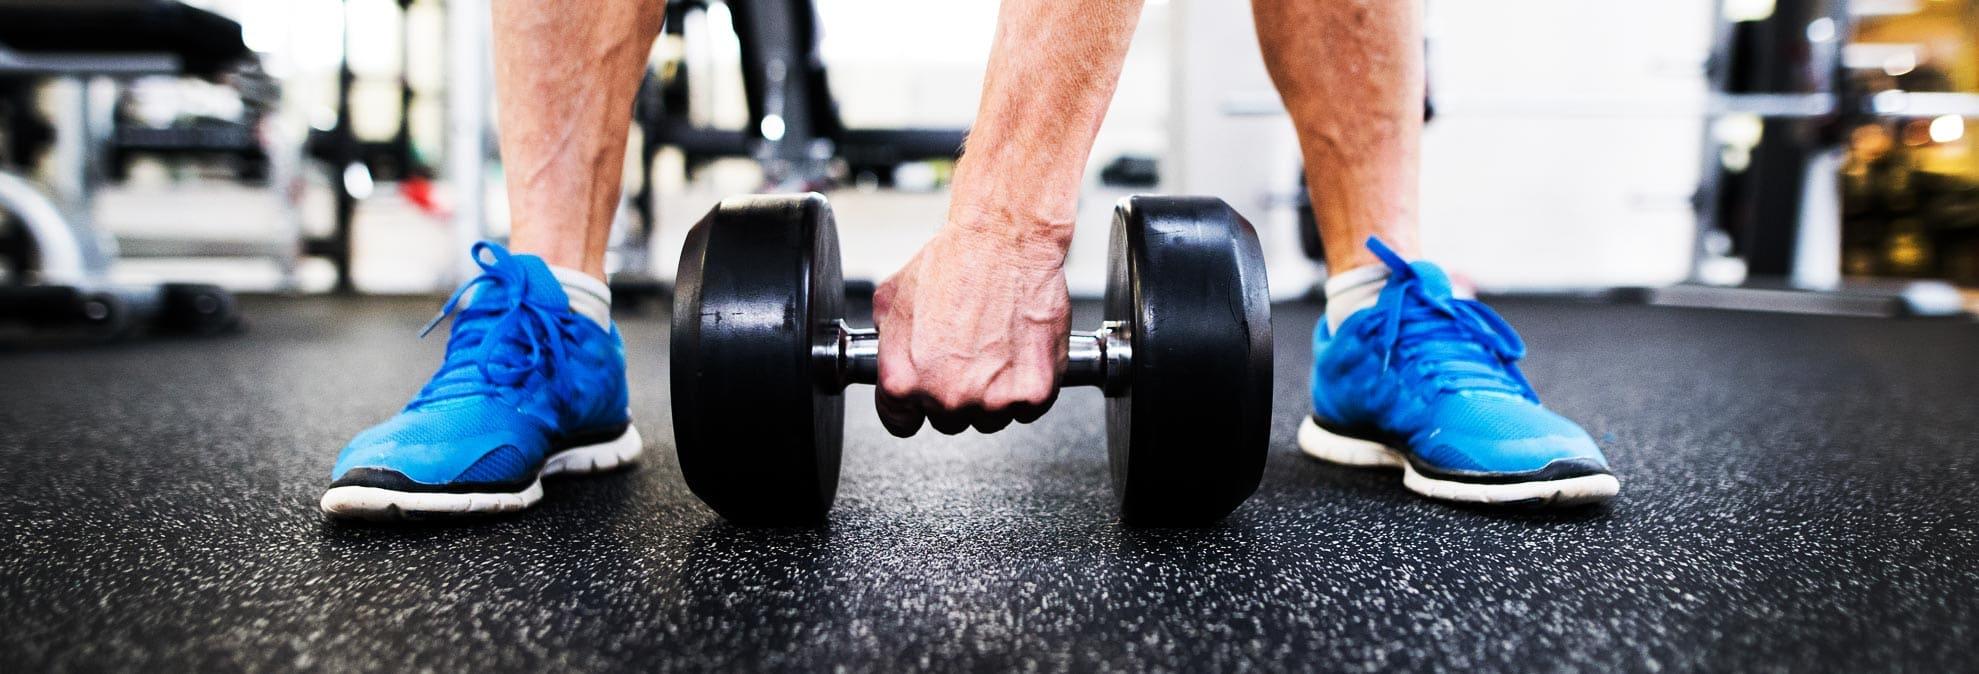 ورزش و سلامتی آتامدتور